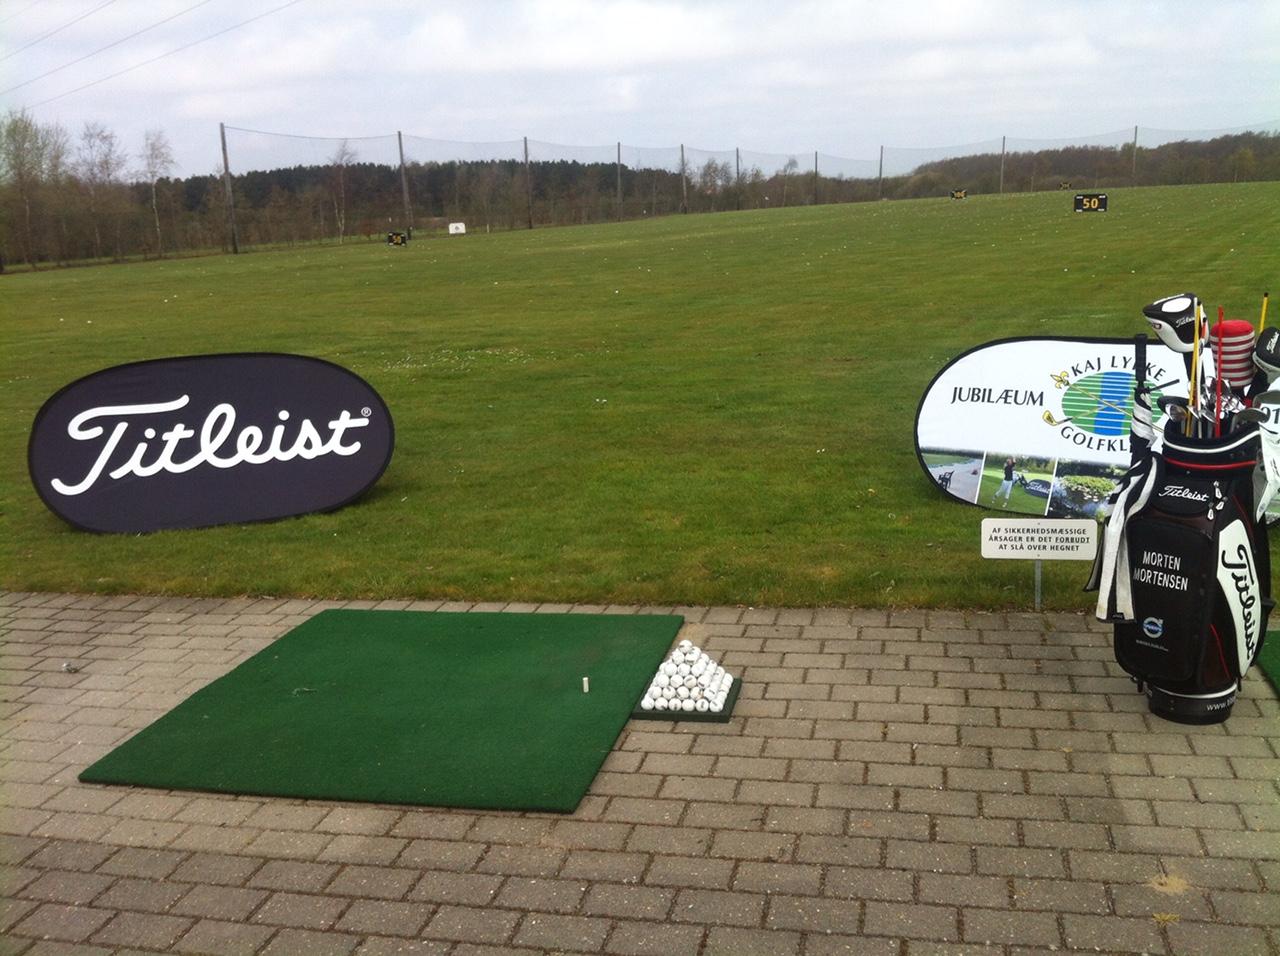 Faciliteter - Kaj Lykke Golfklub